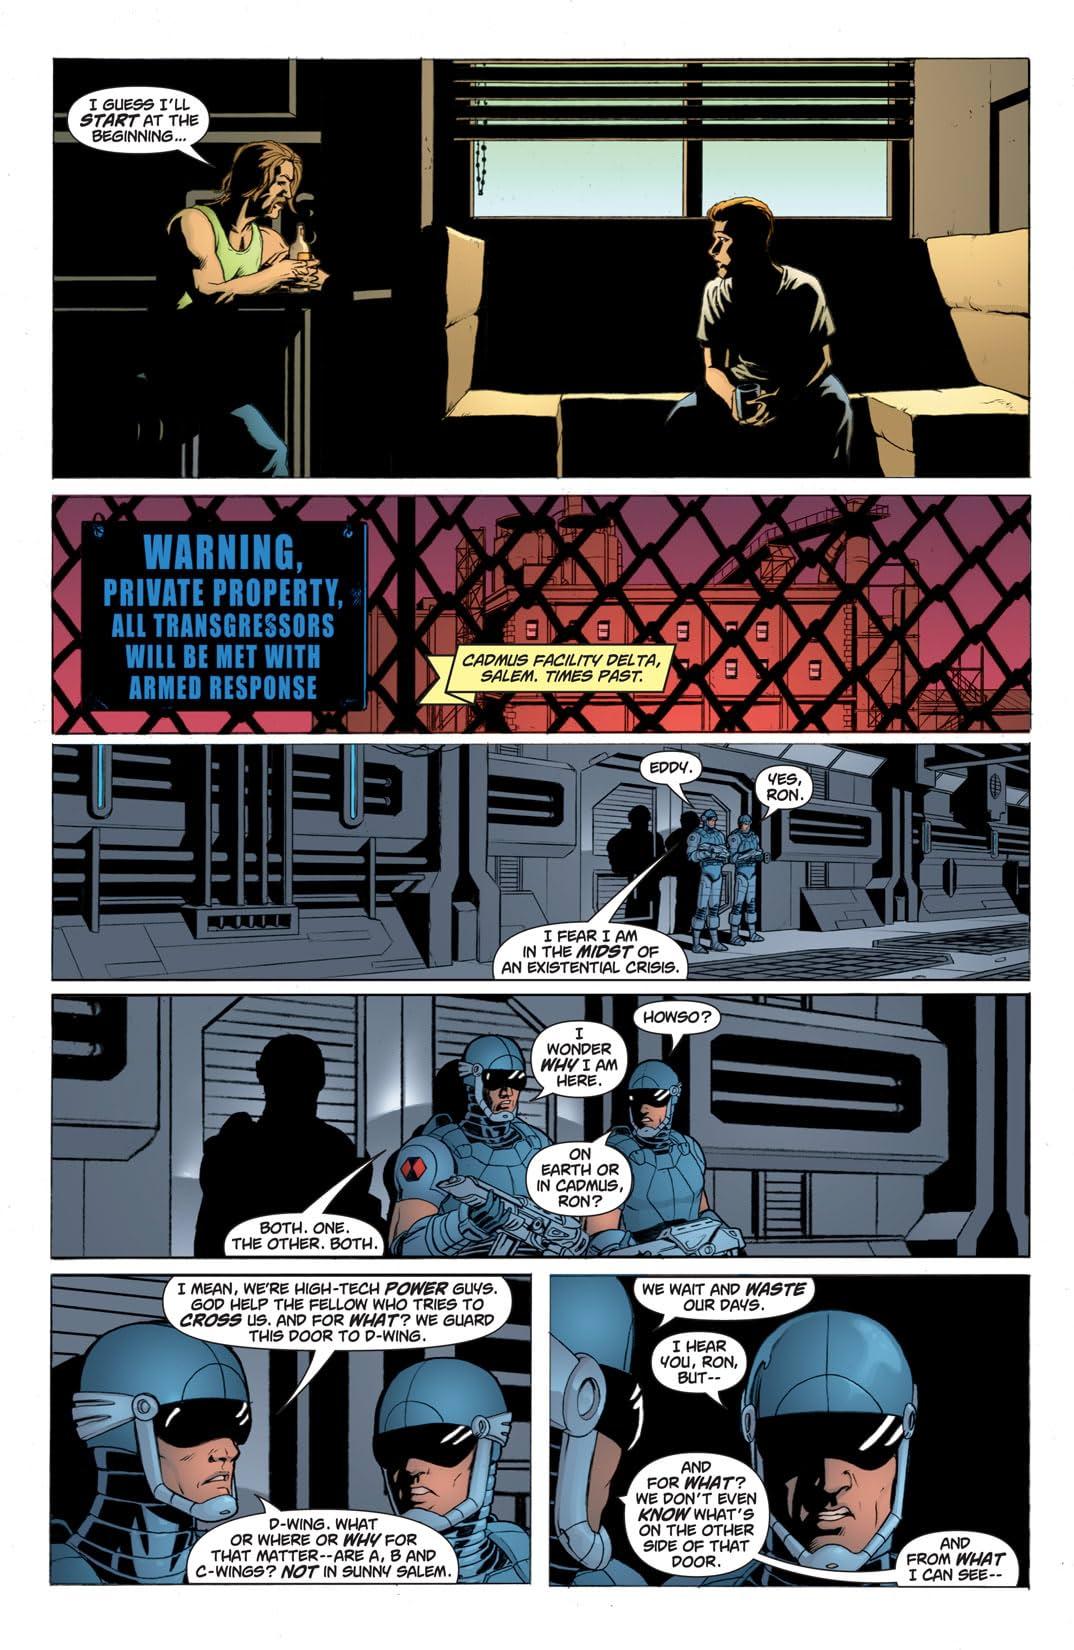 Adventure Comics (2009-2011): Special #1